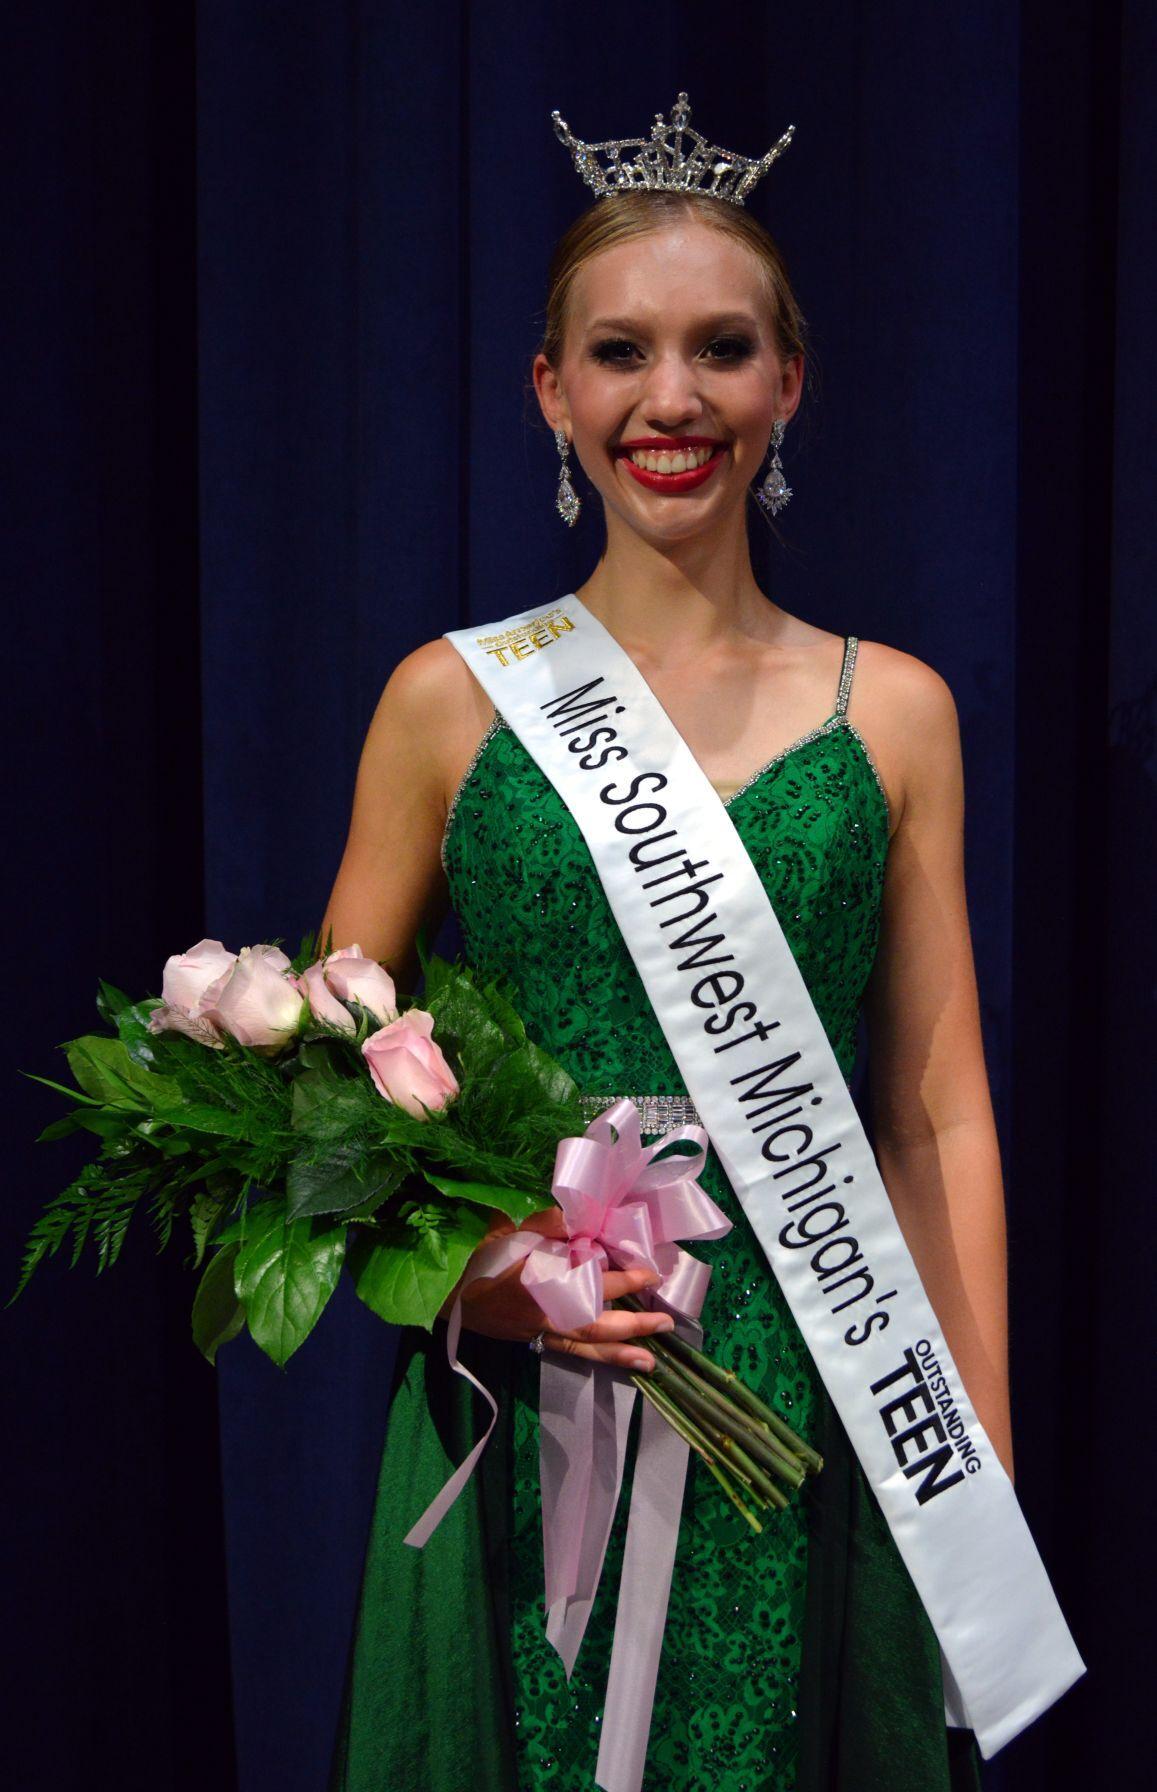 2022 Lauren Vegter Standing after crowning.JPG